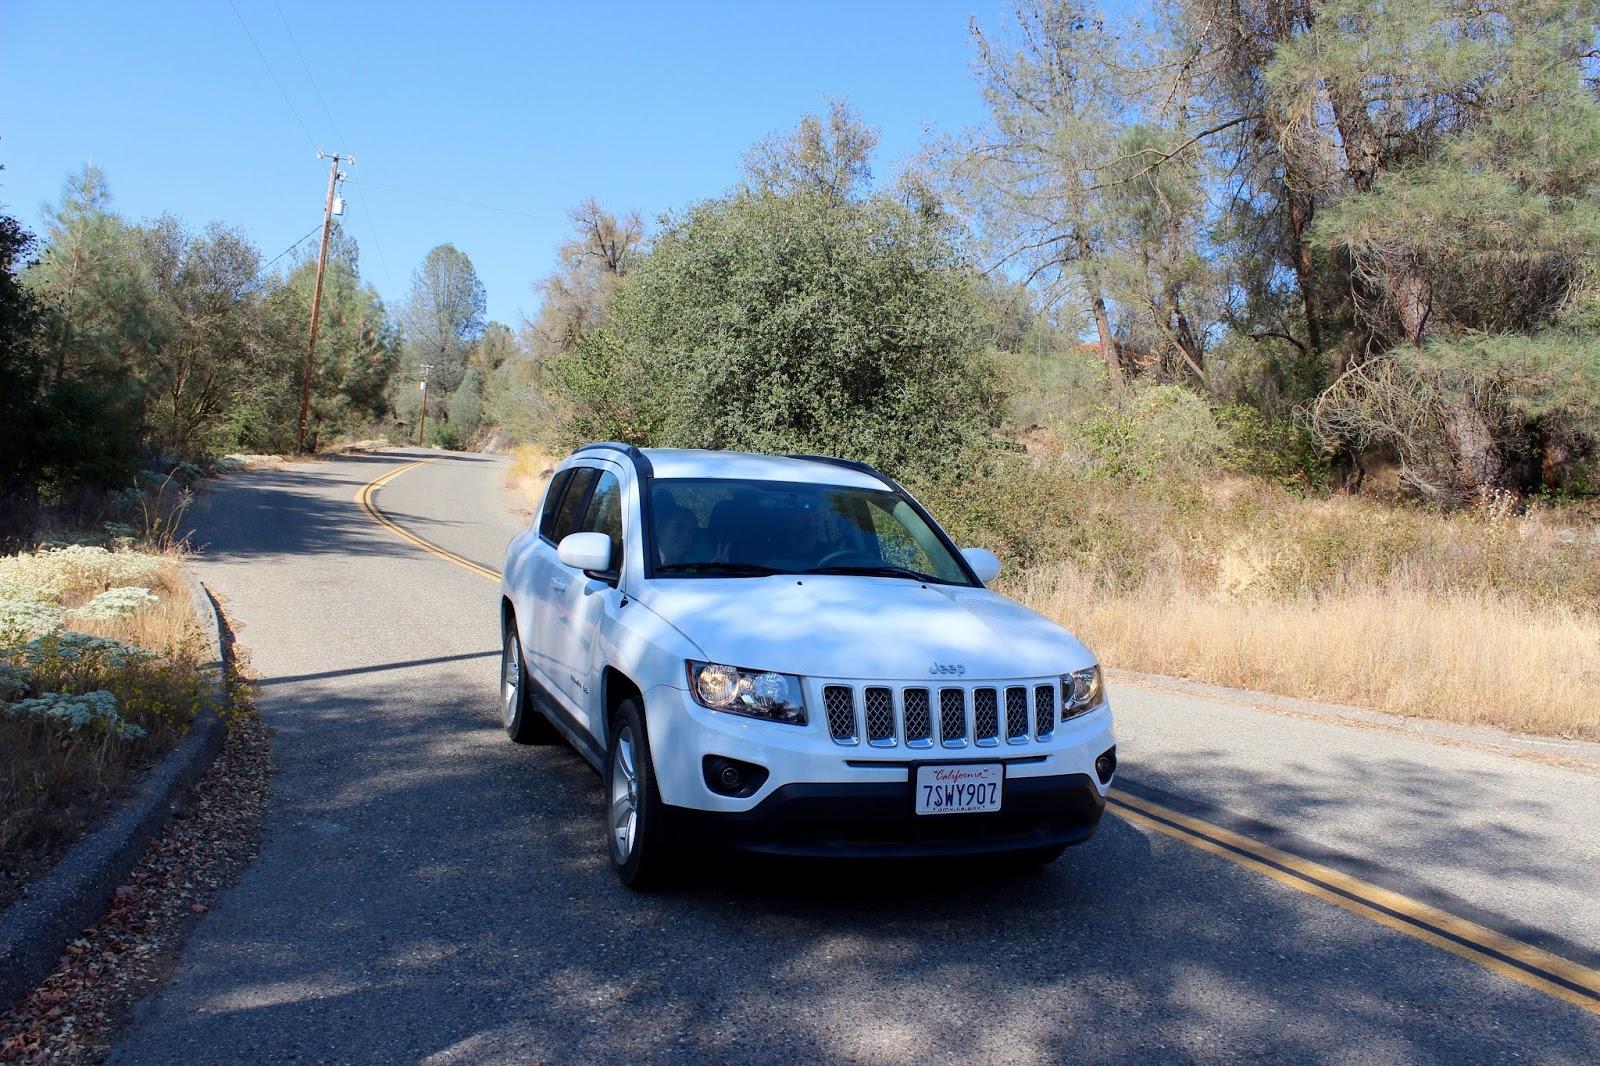 SUV rental car on road trip through California USA